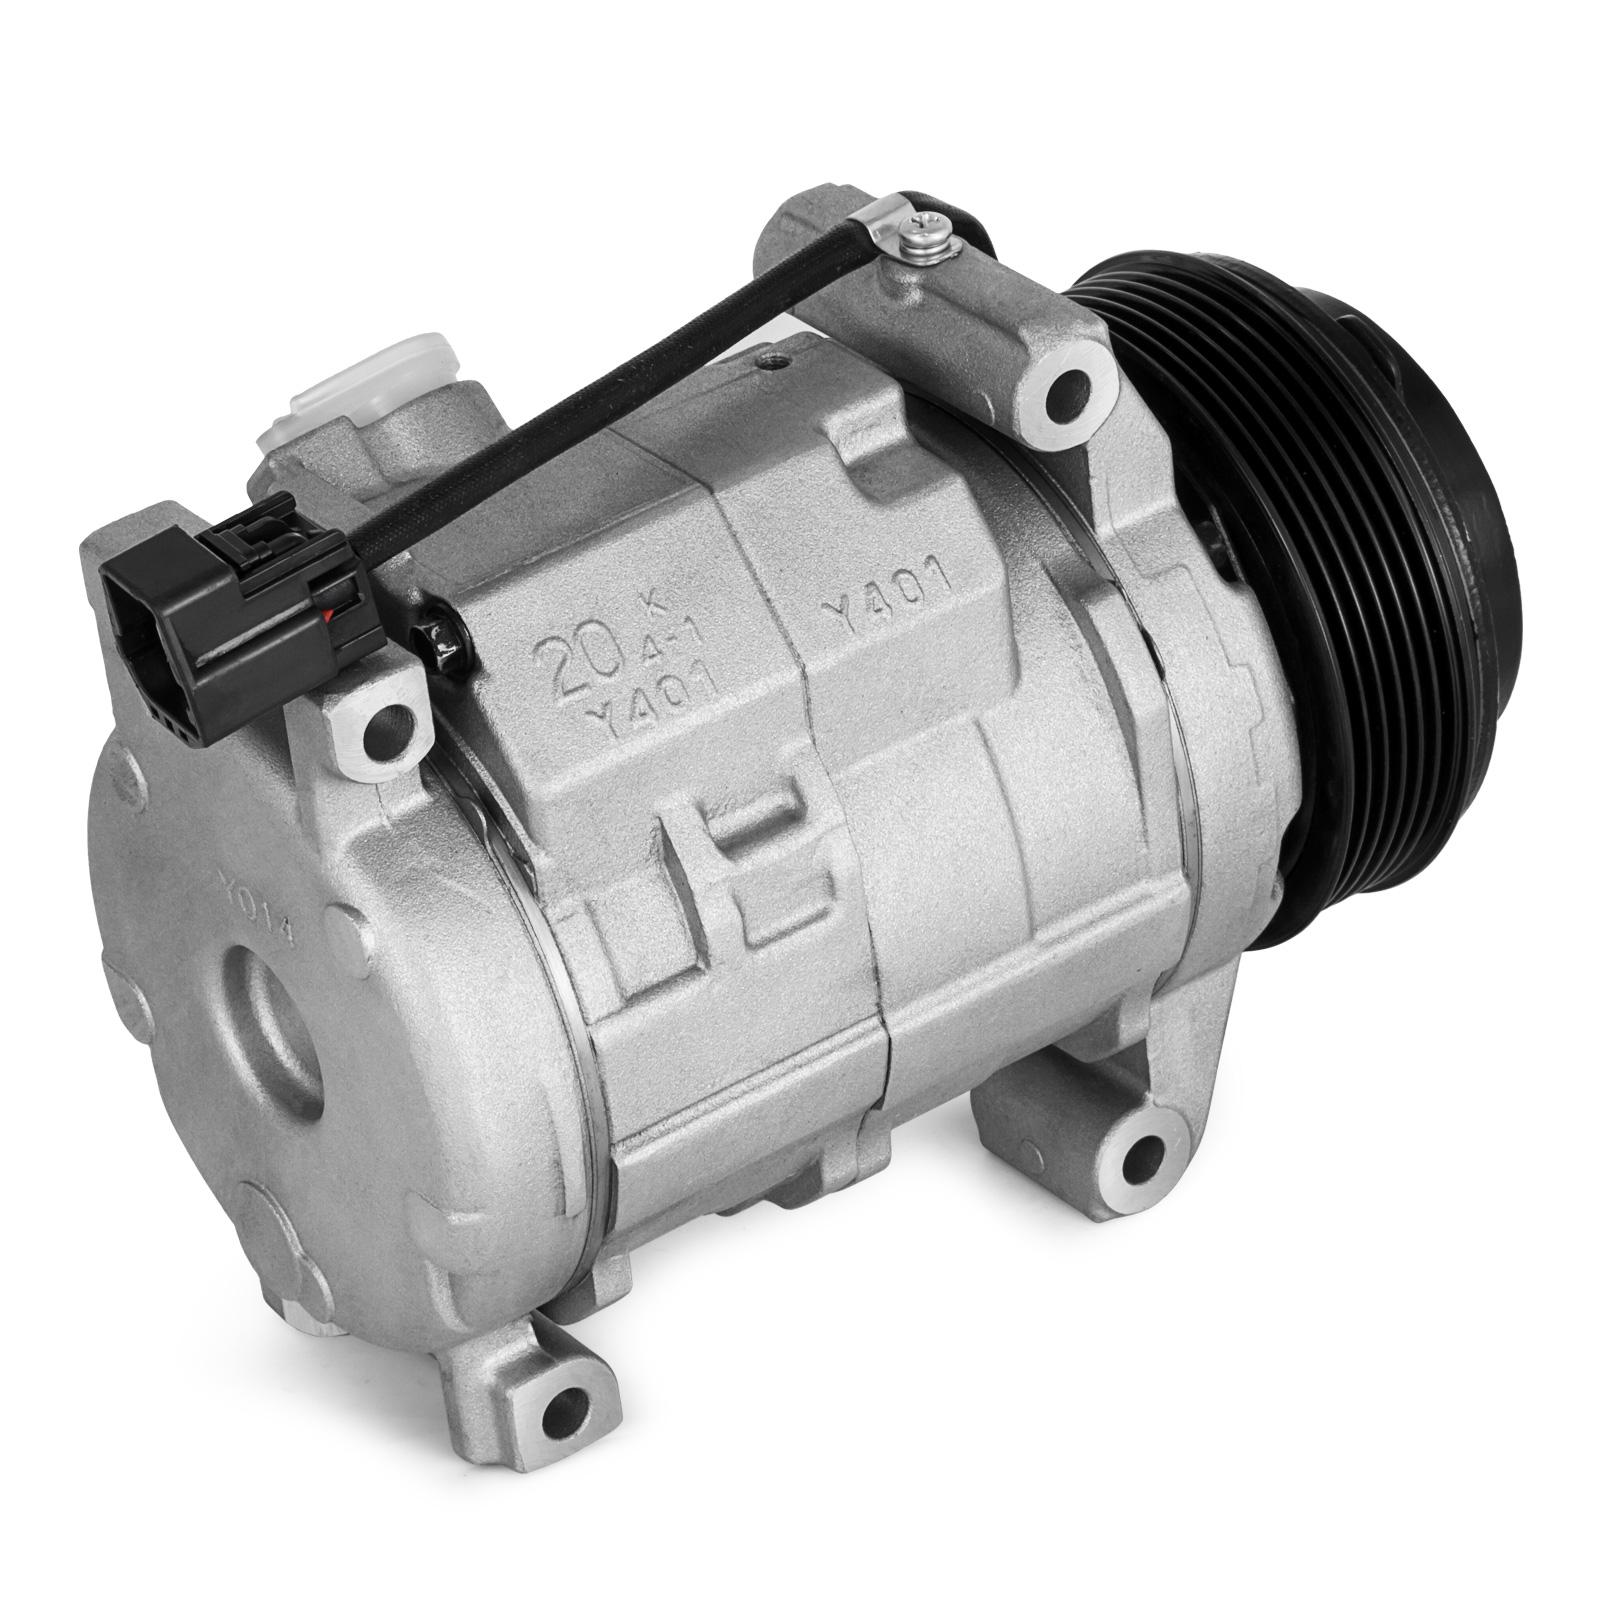 2008 Gmc Acadia Ac Compressor: AC Compressor CO 21625C For Enclave Traverse Acadia